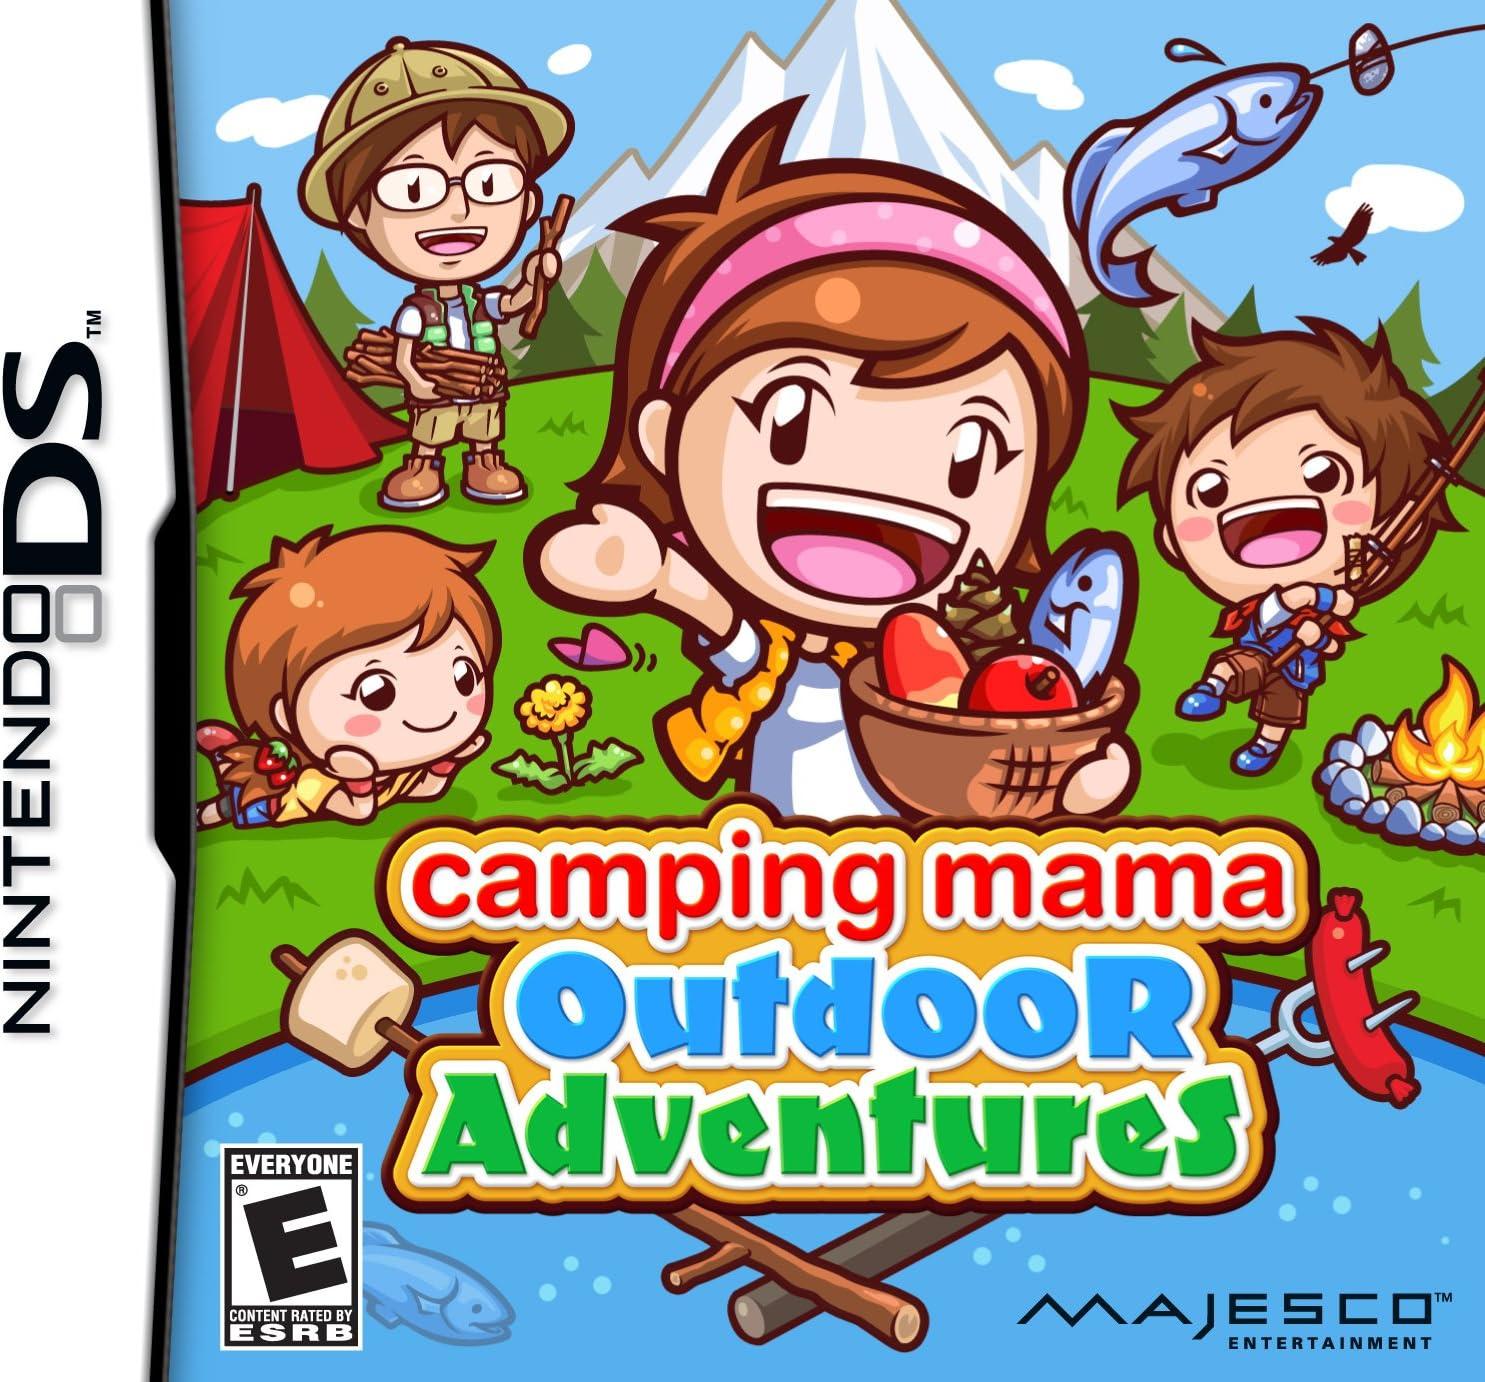 Amazoncom Camping Mama Outdoor Adventures Nintendo DS Majesco